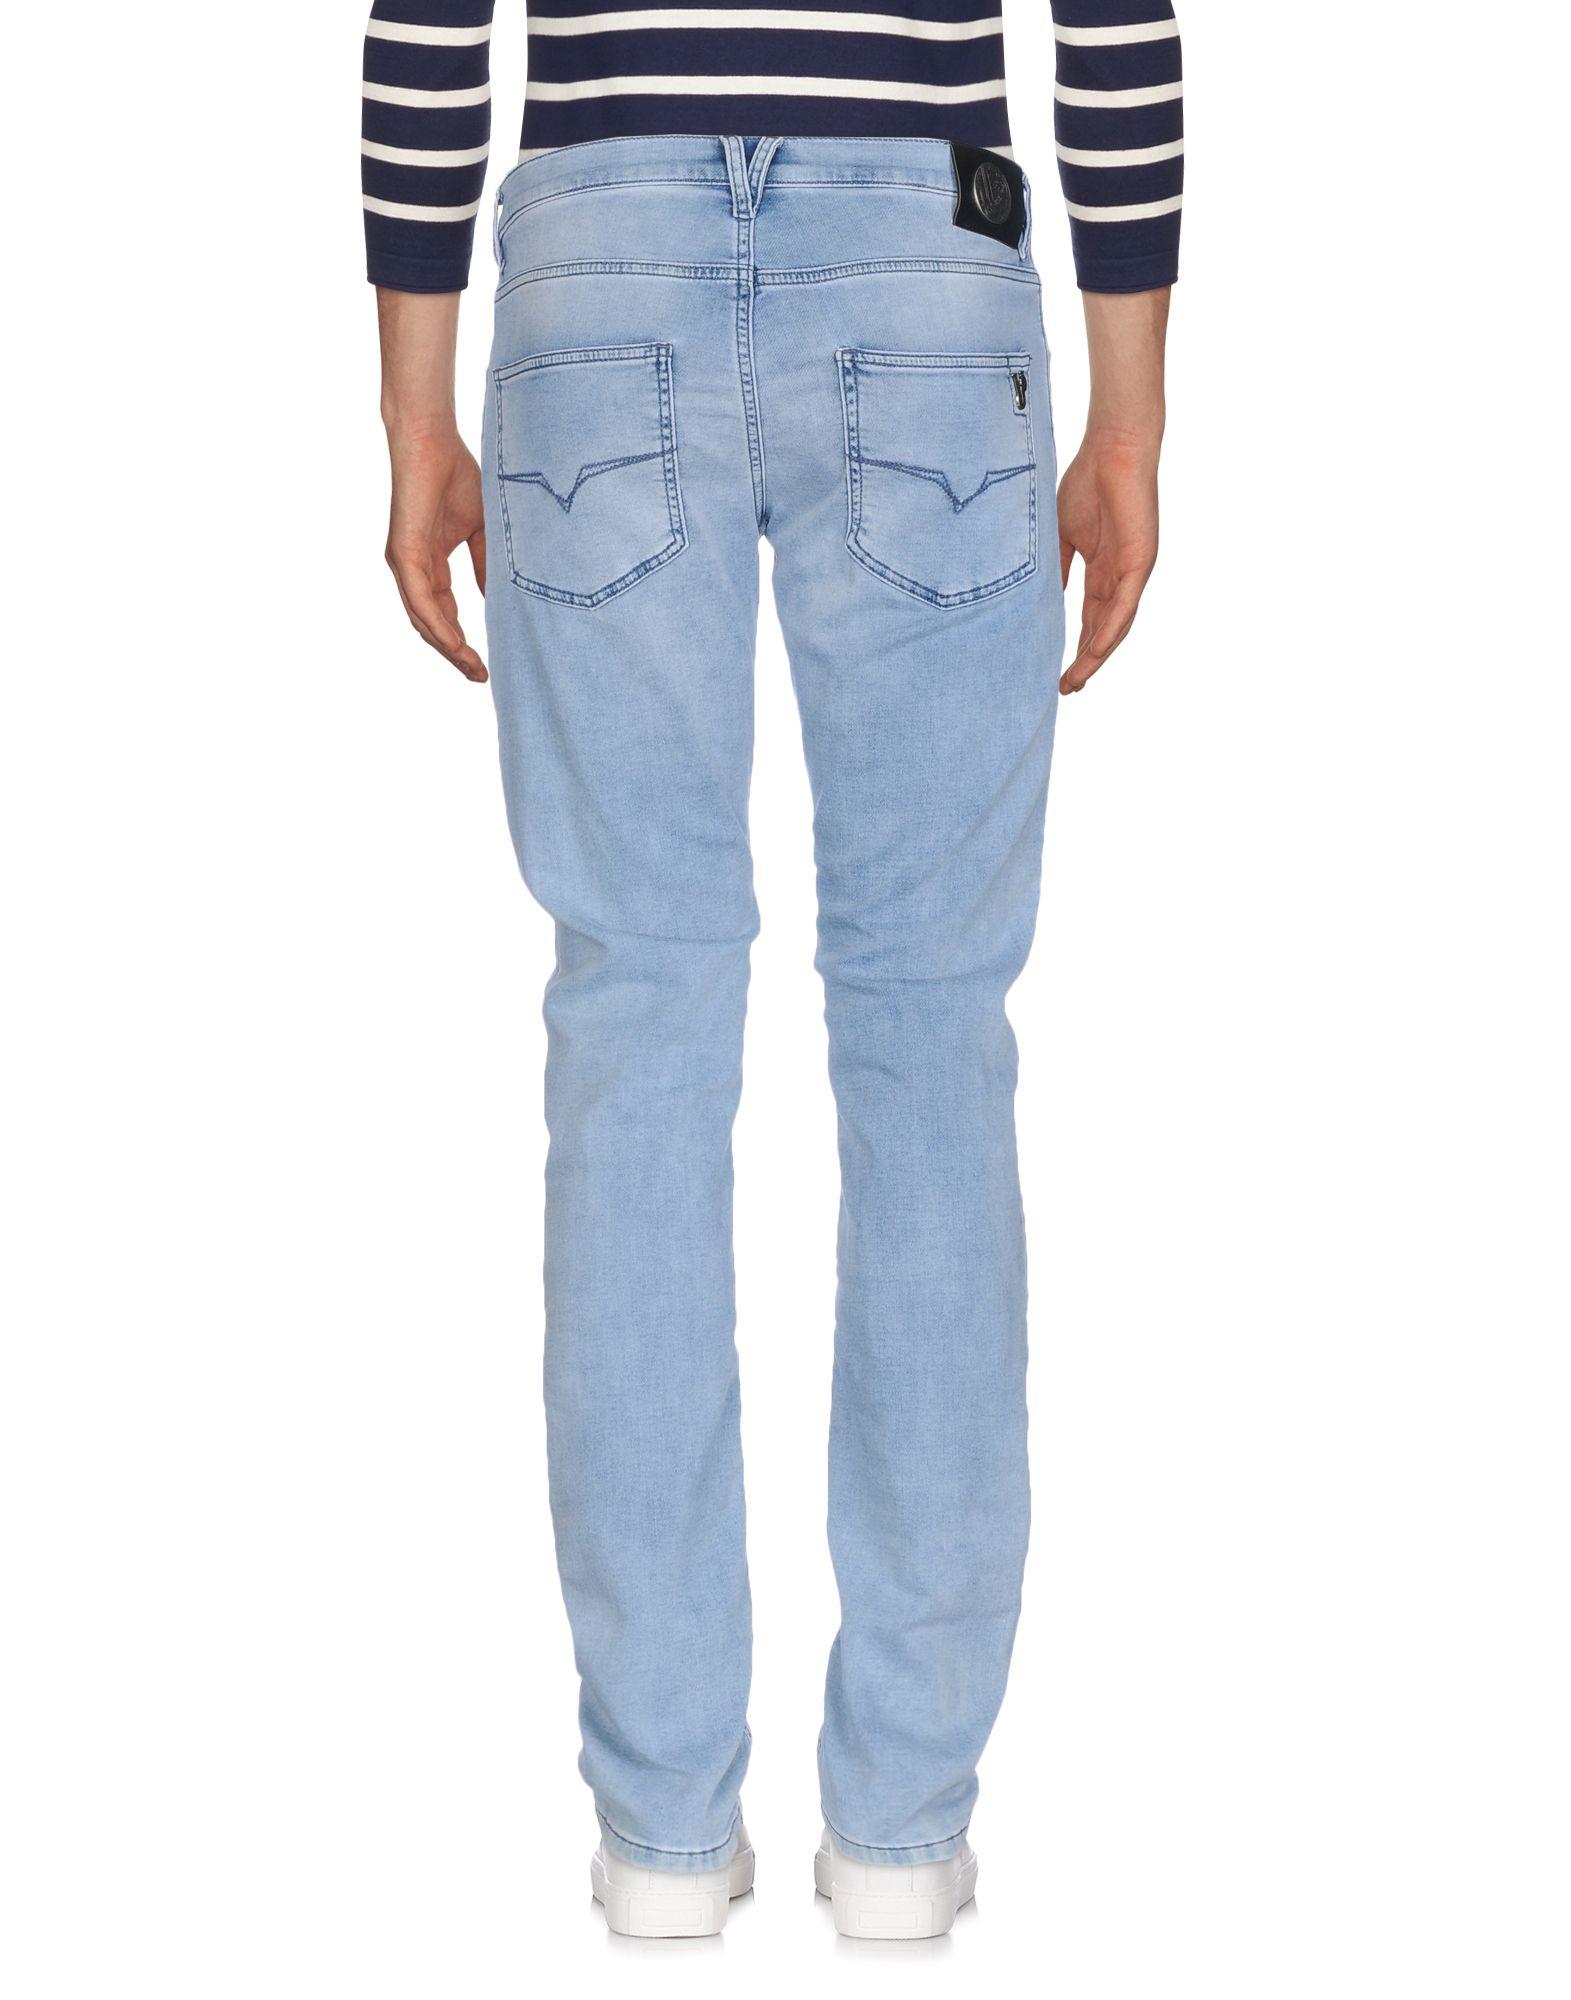 Pantaloni Jeans Jeans Jeans Versace Jeans Uomo - 42657649XD f29ad2